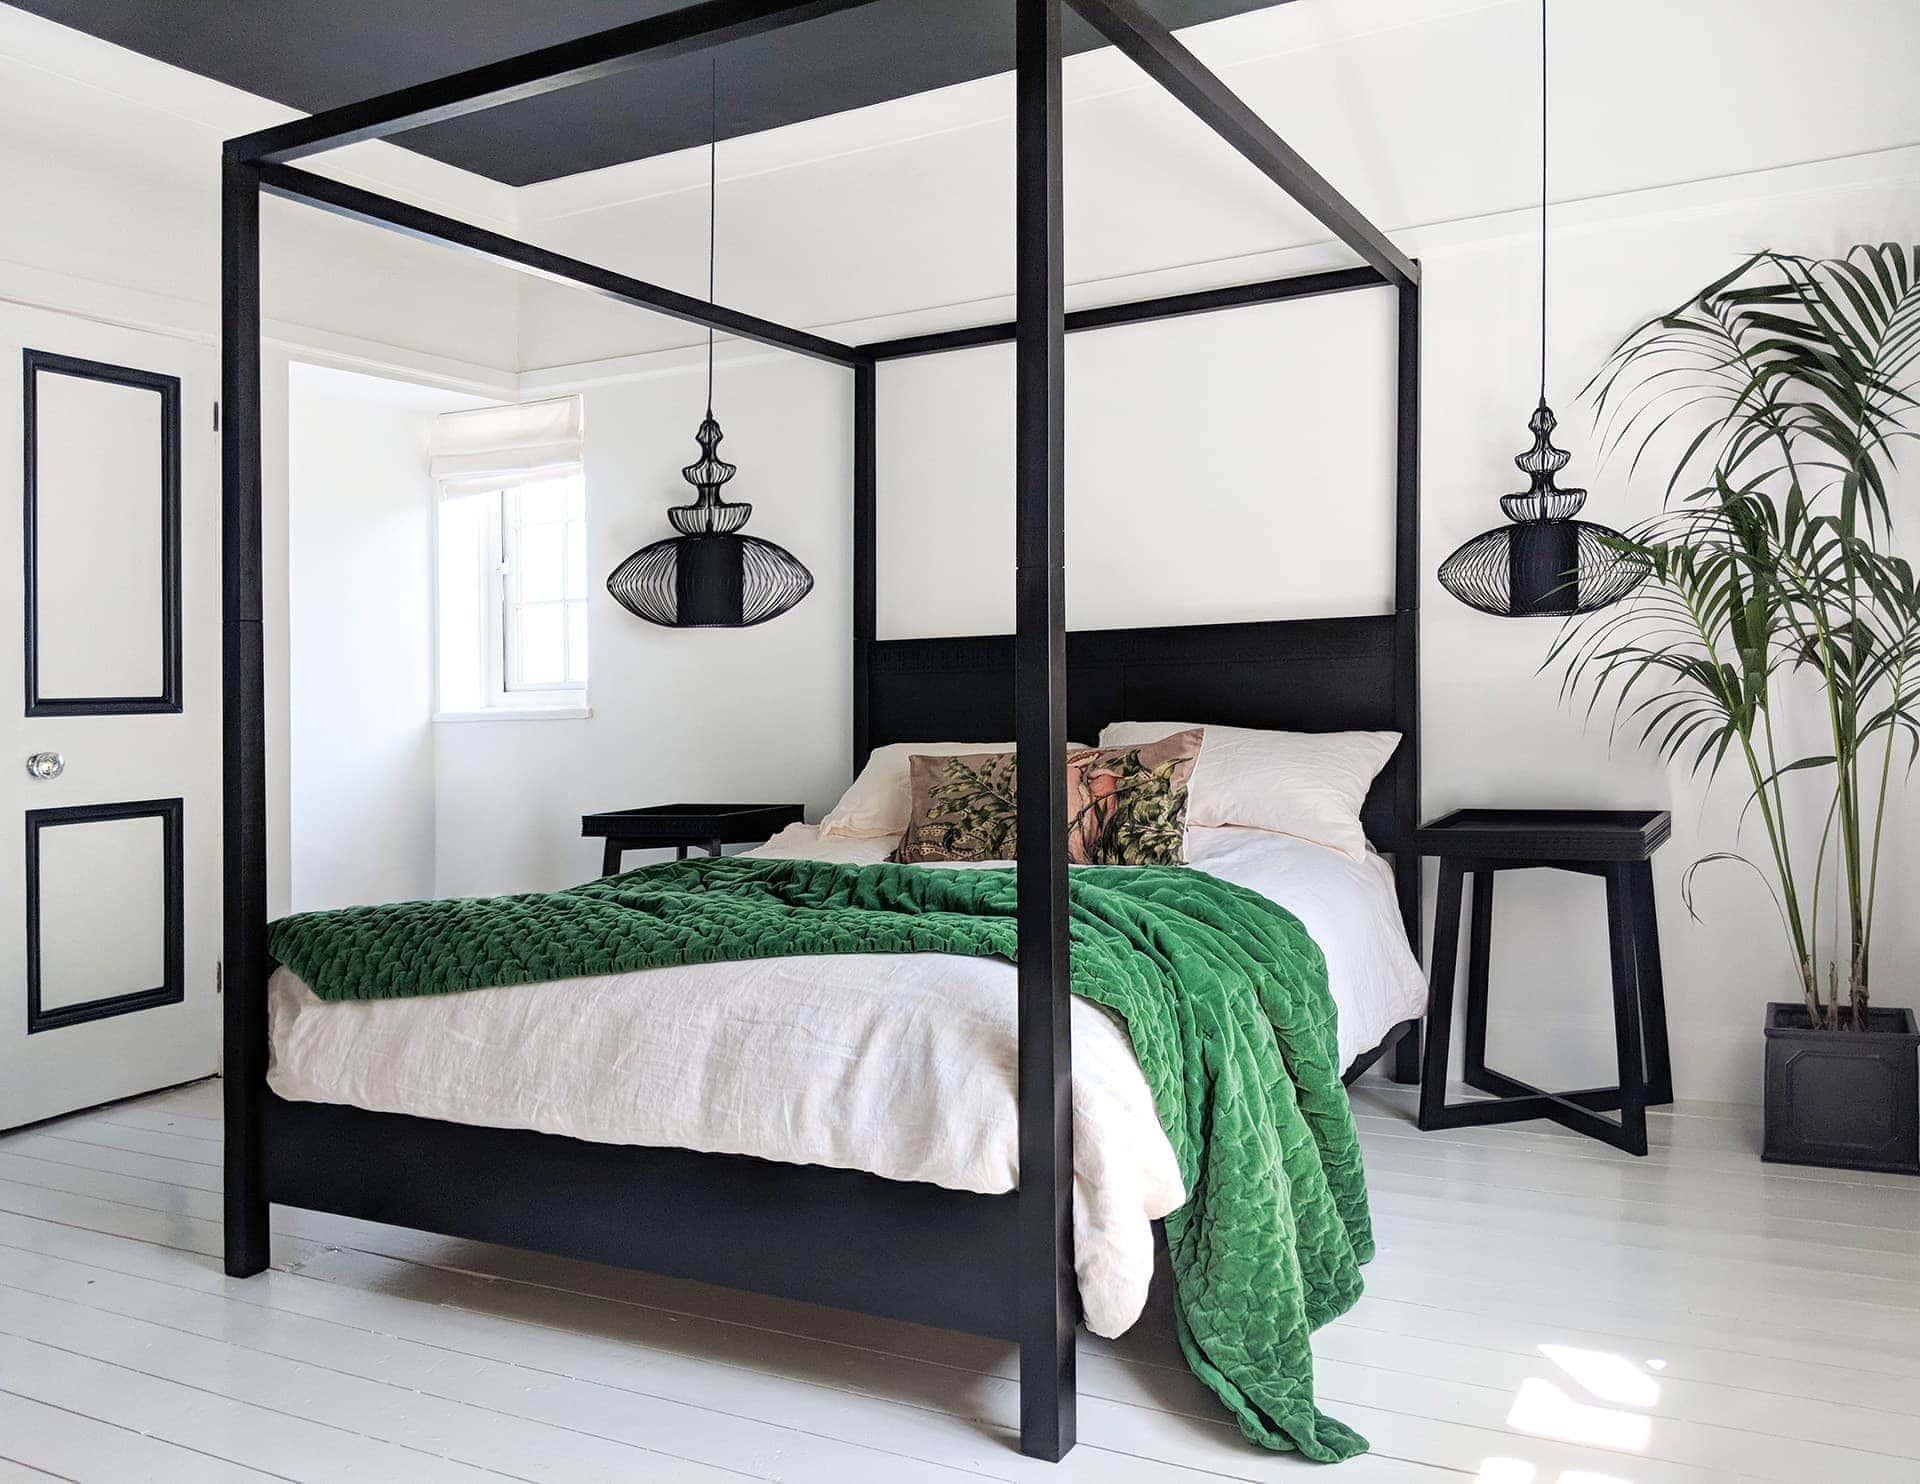 Cheats on Choosing Pendant Lights for a Master Bedroom